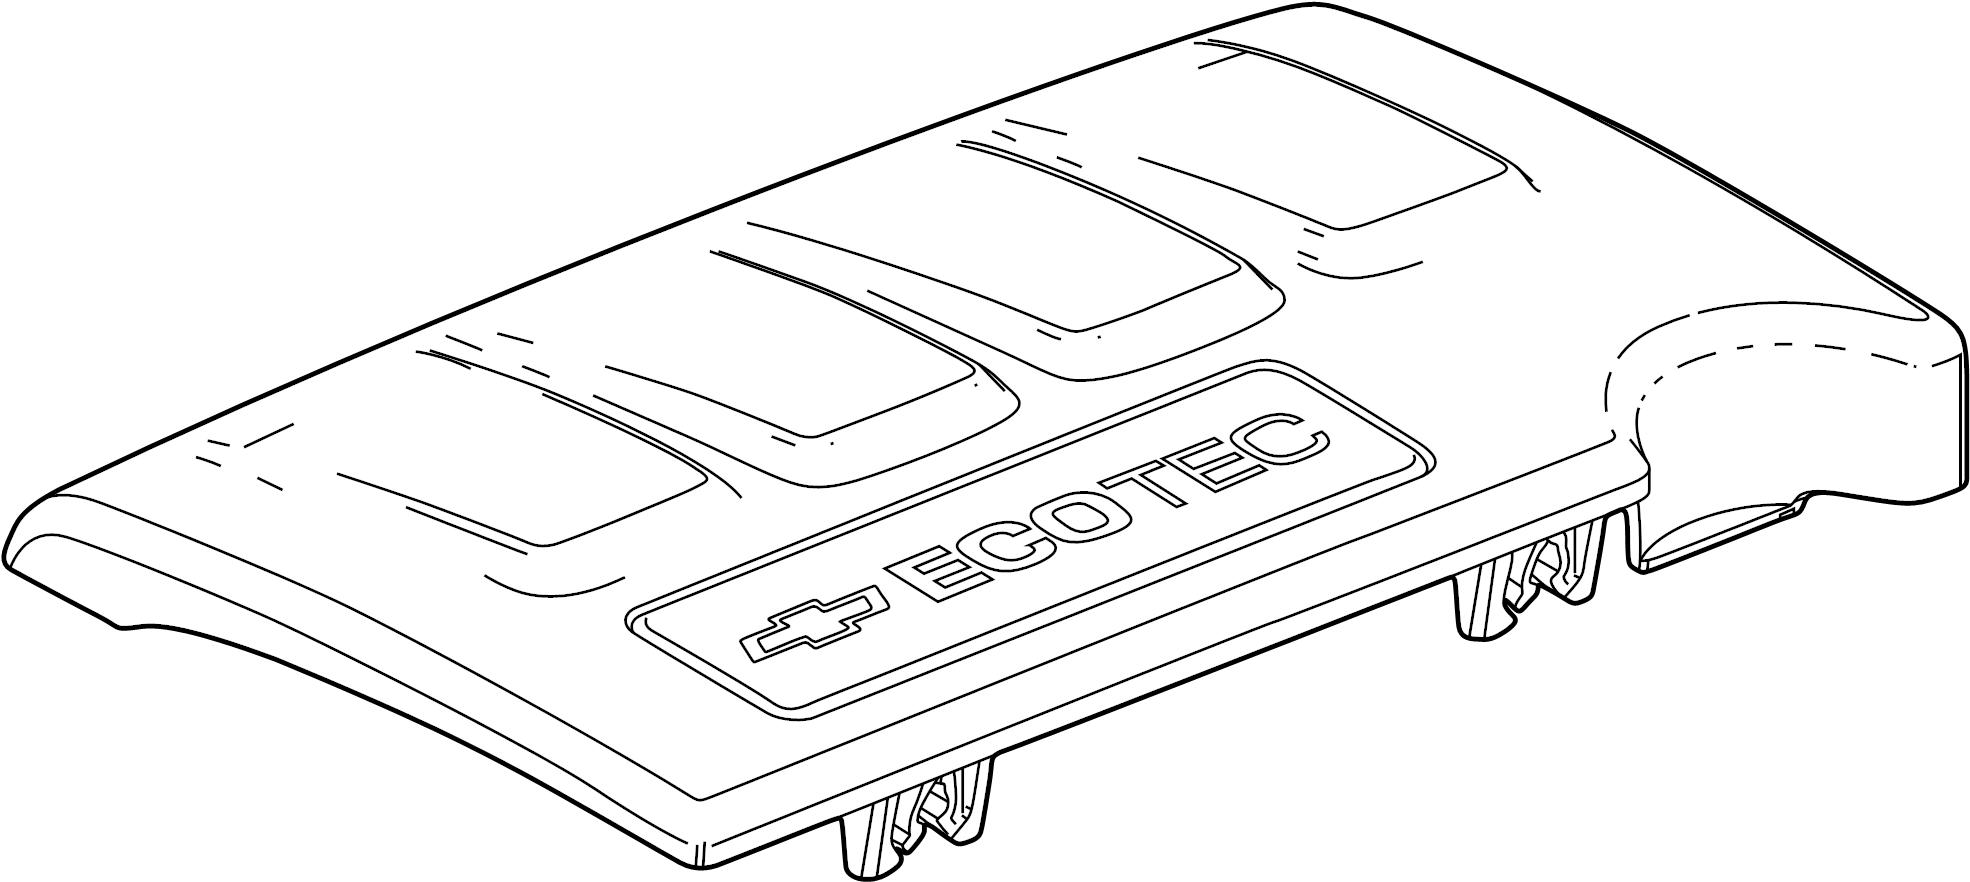 Chevrolet Sonic Emblem Engine Cover 1 4 Liter Turbo